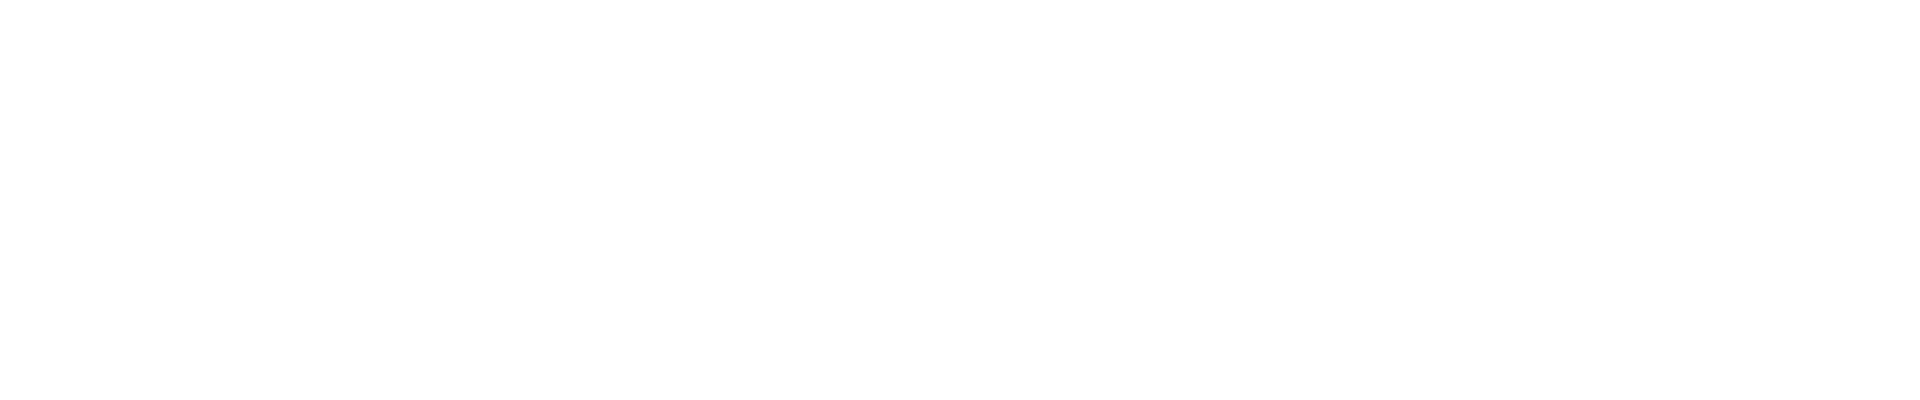 Kevin R. D. Shepherd  Commentaries